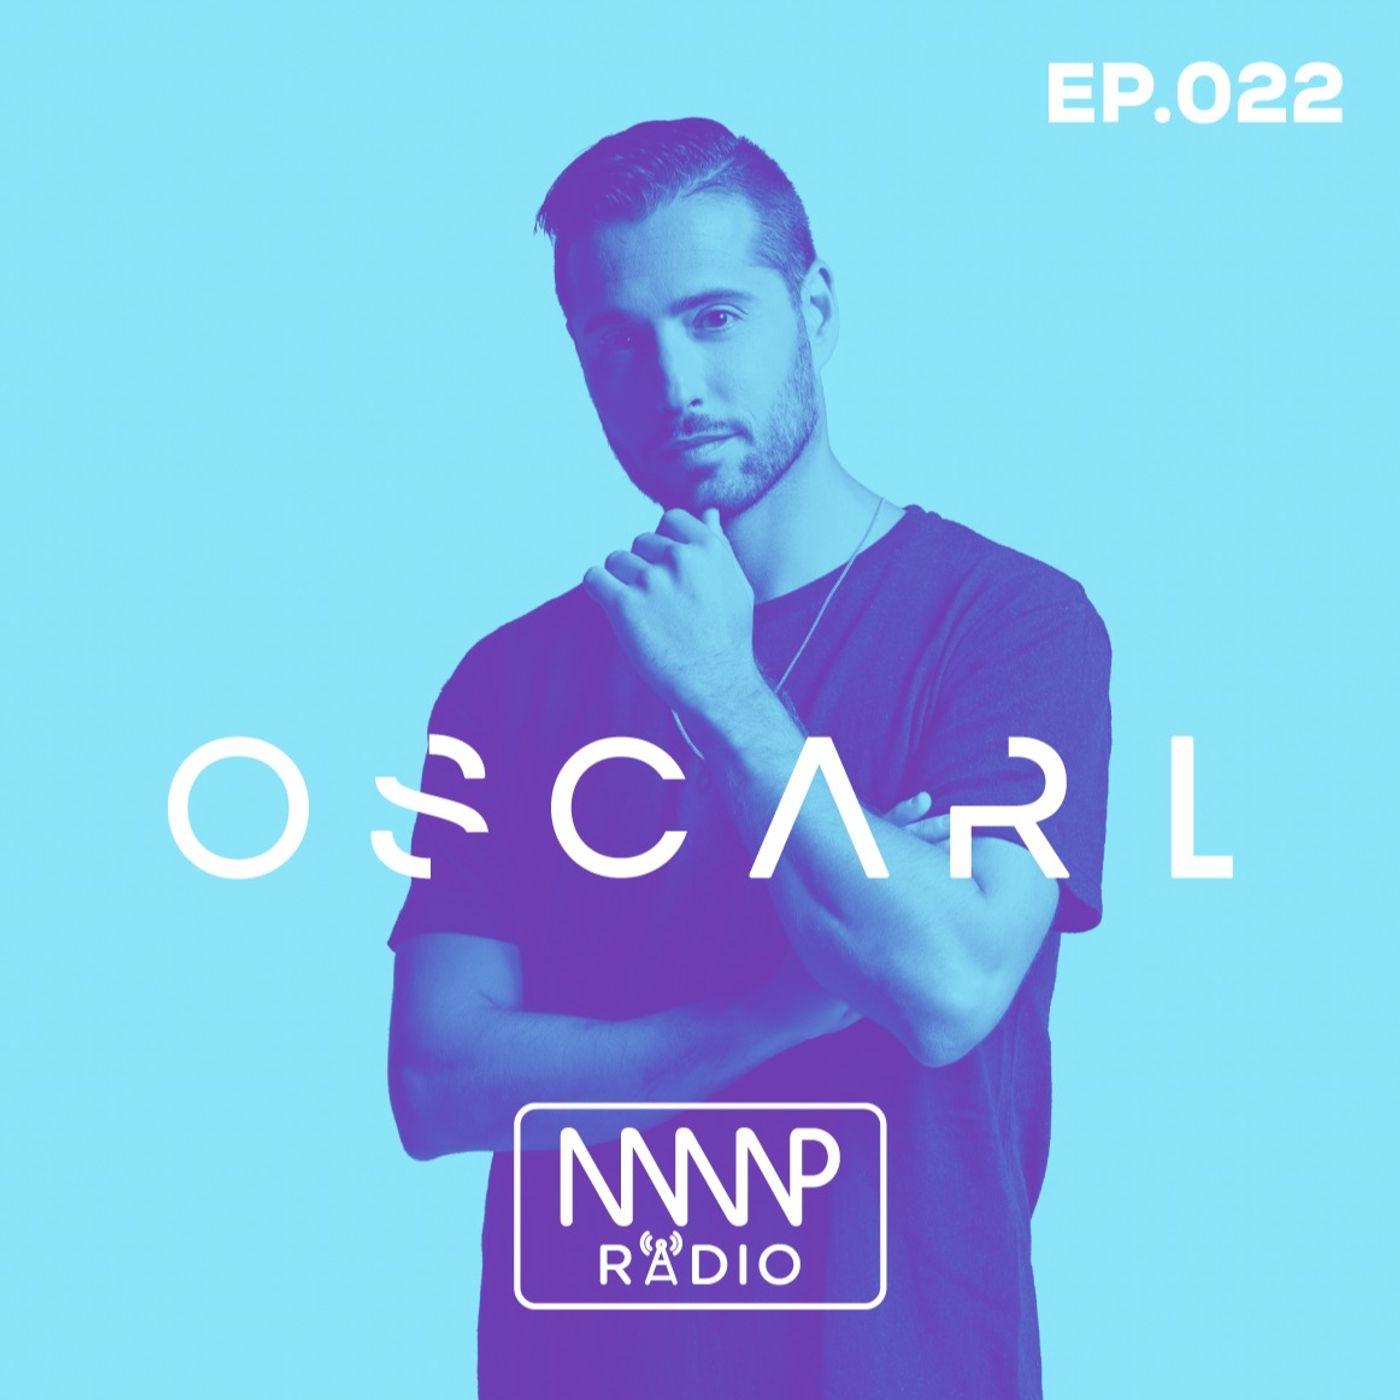 OSCAR L, Guest Mix - MMP Radio, EP022